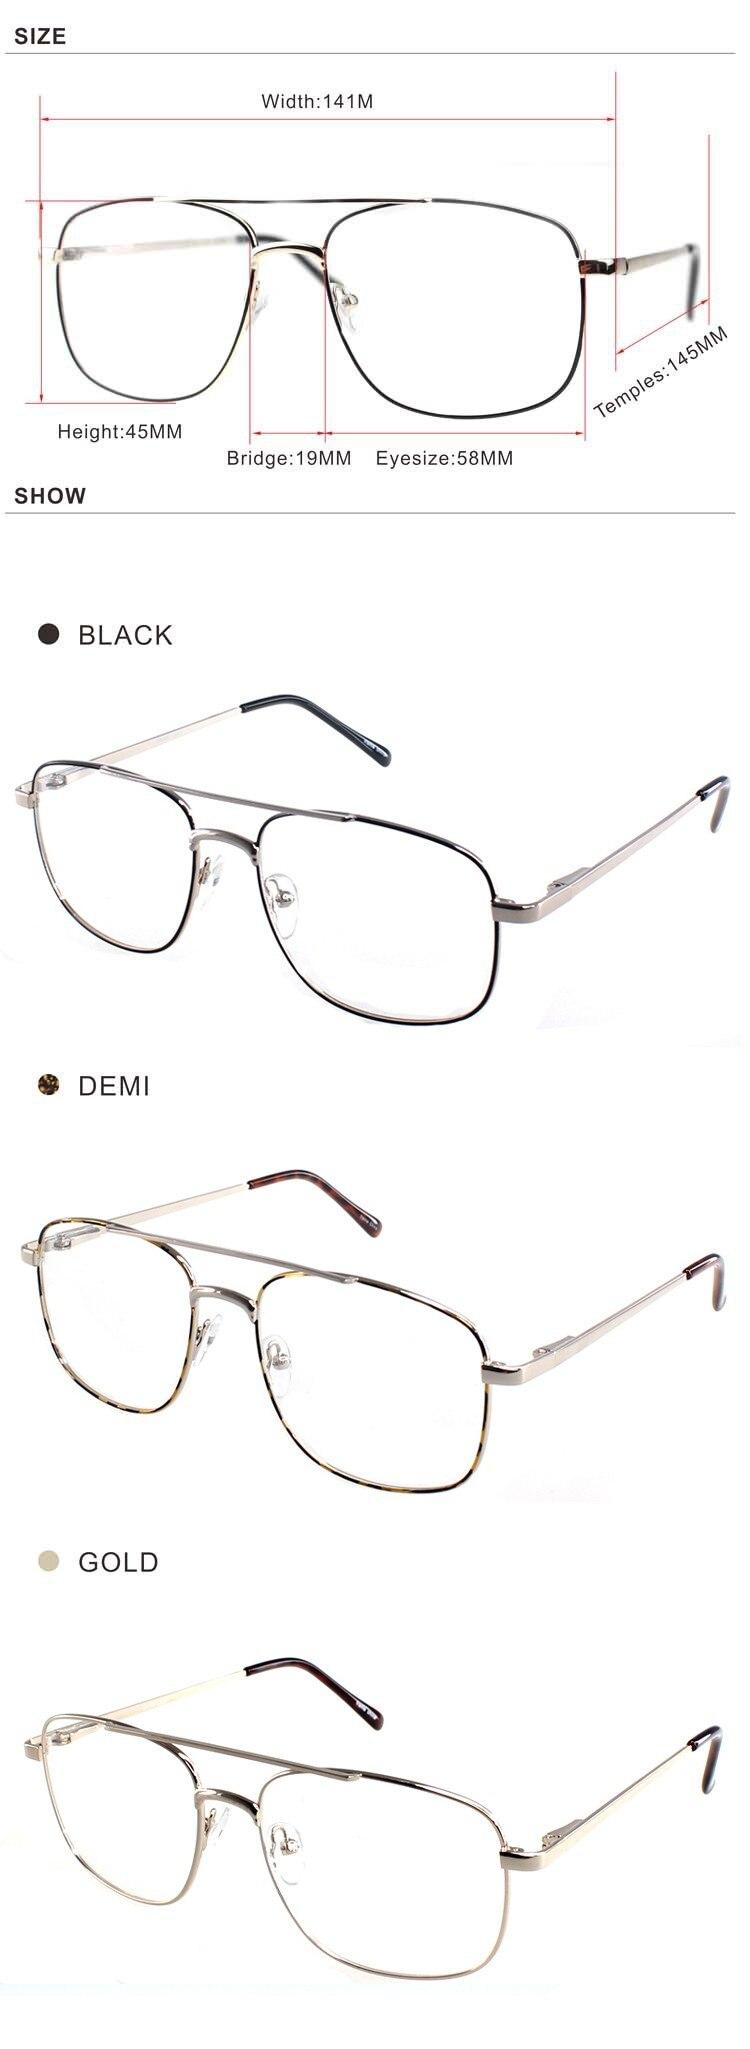 ZENOIC 2018 Retro Brand Design EyeGlasses Frame Men Vintage Gold Metal Optical Oculos De Grau Classical Couple Eyewear glasses (2)